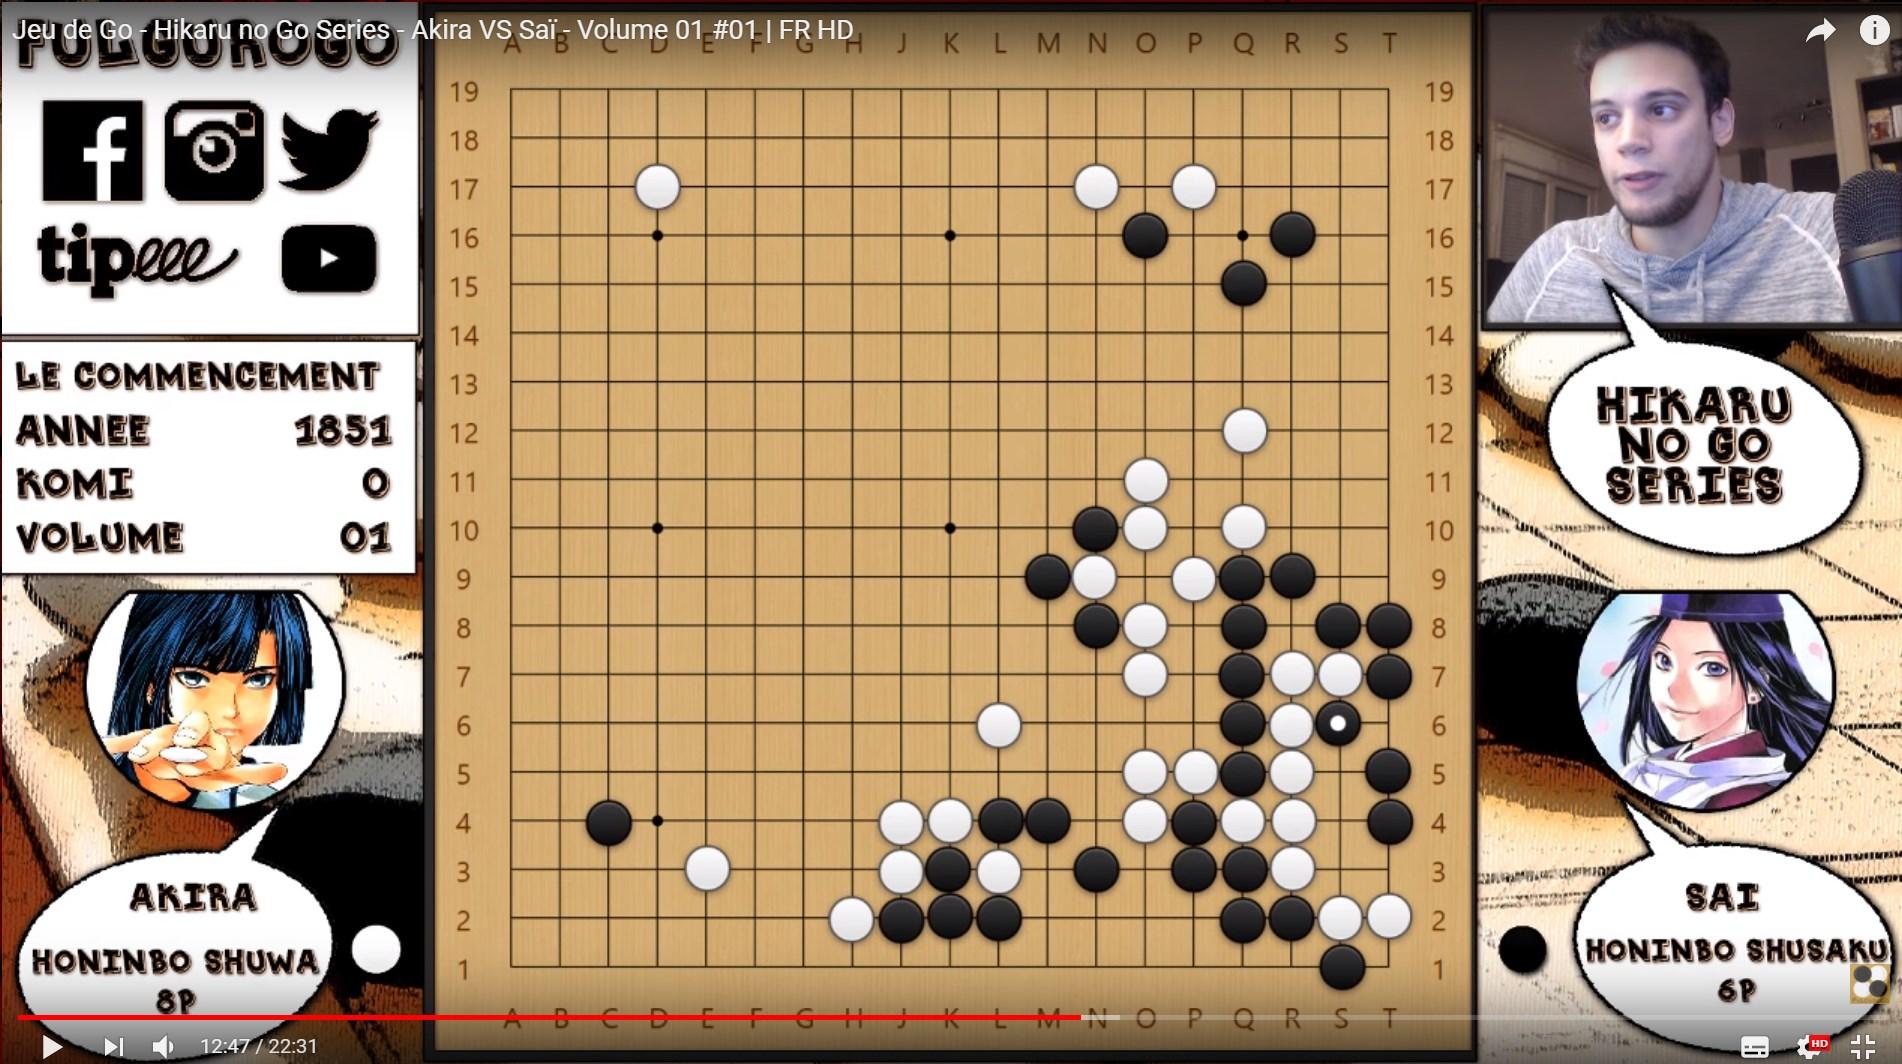 Hikaru no Go Series